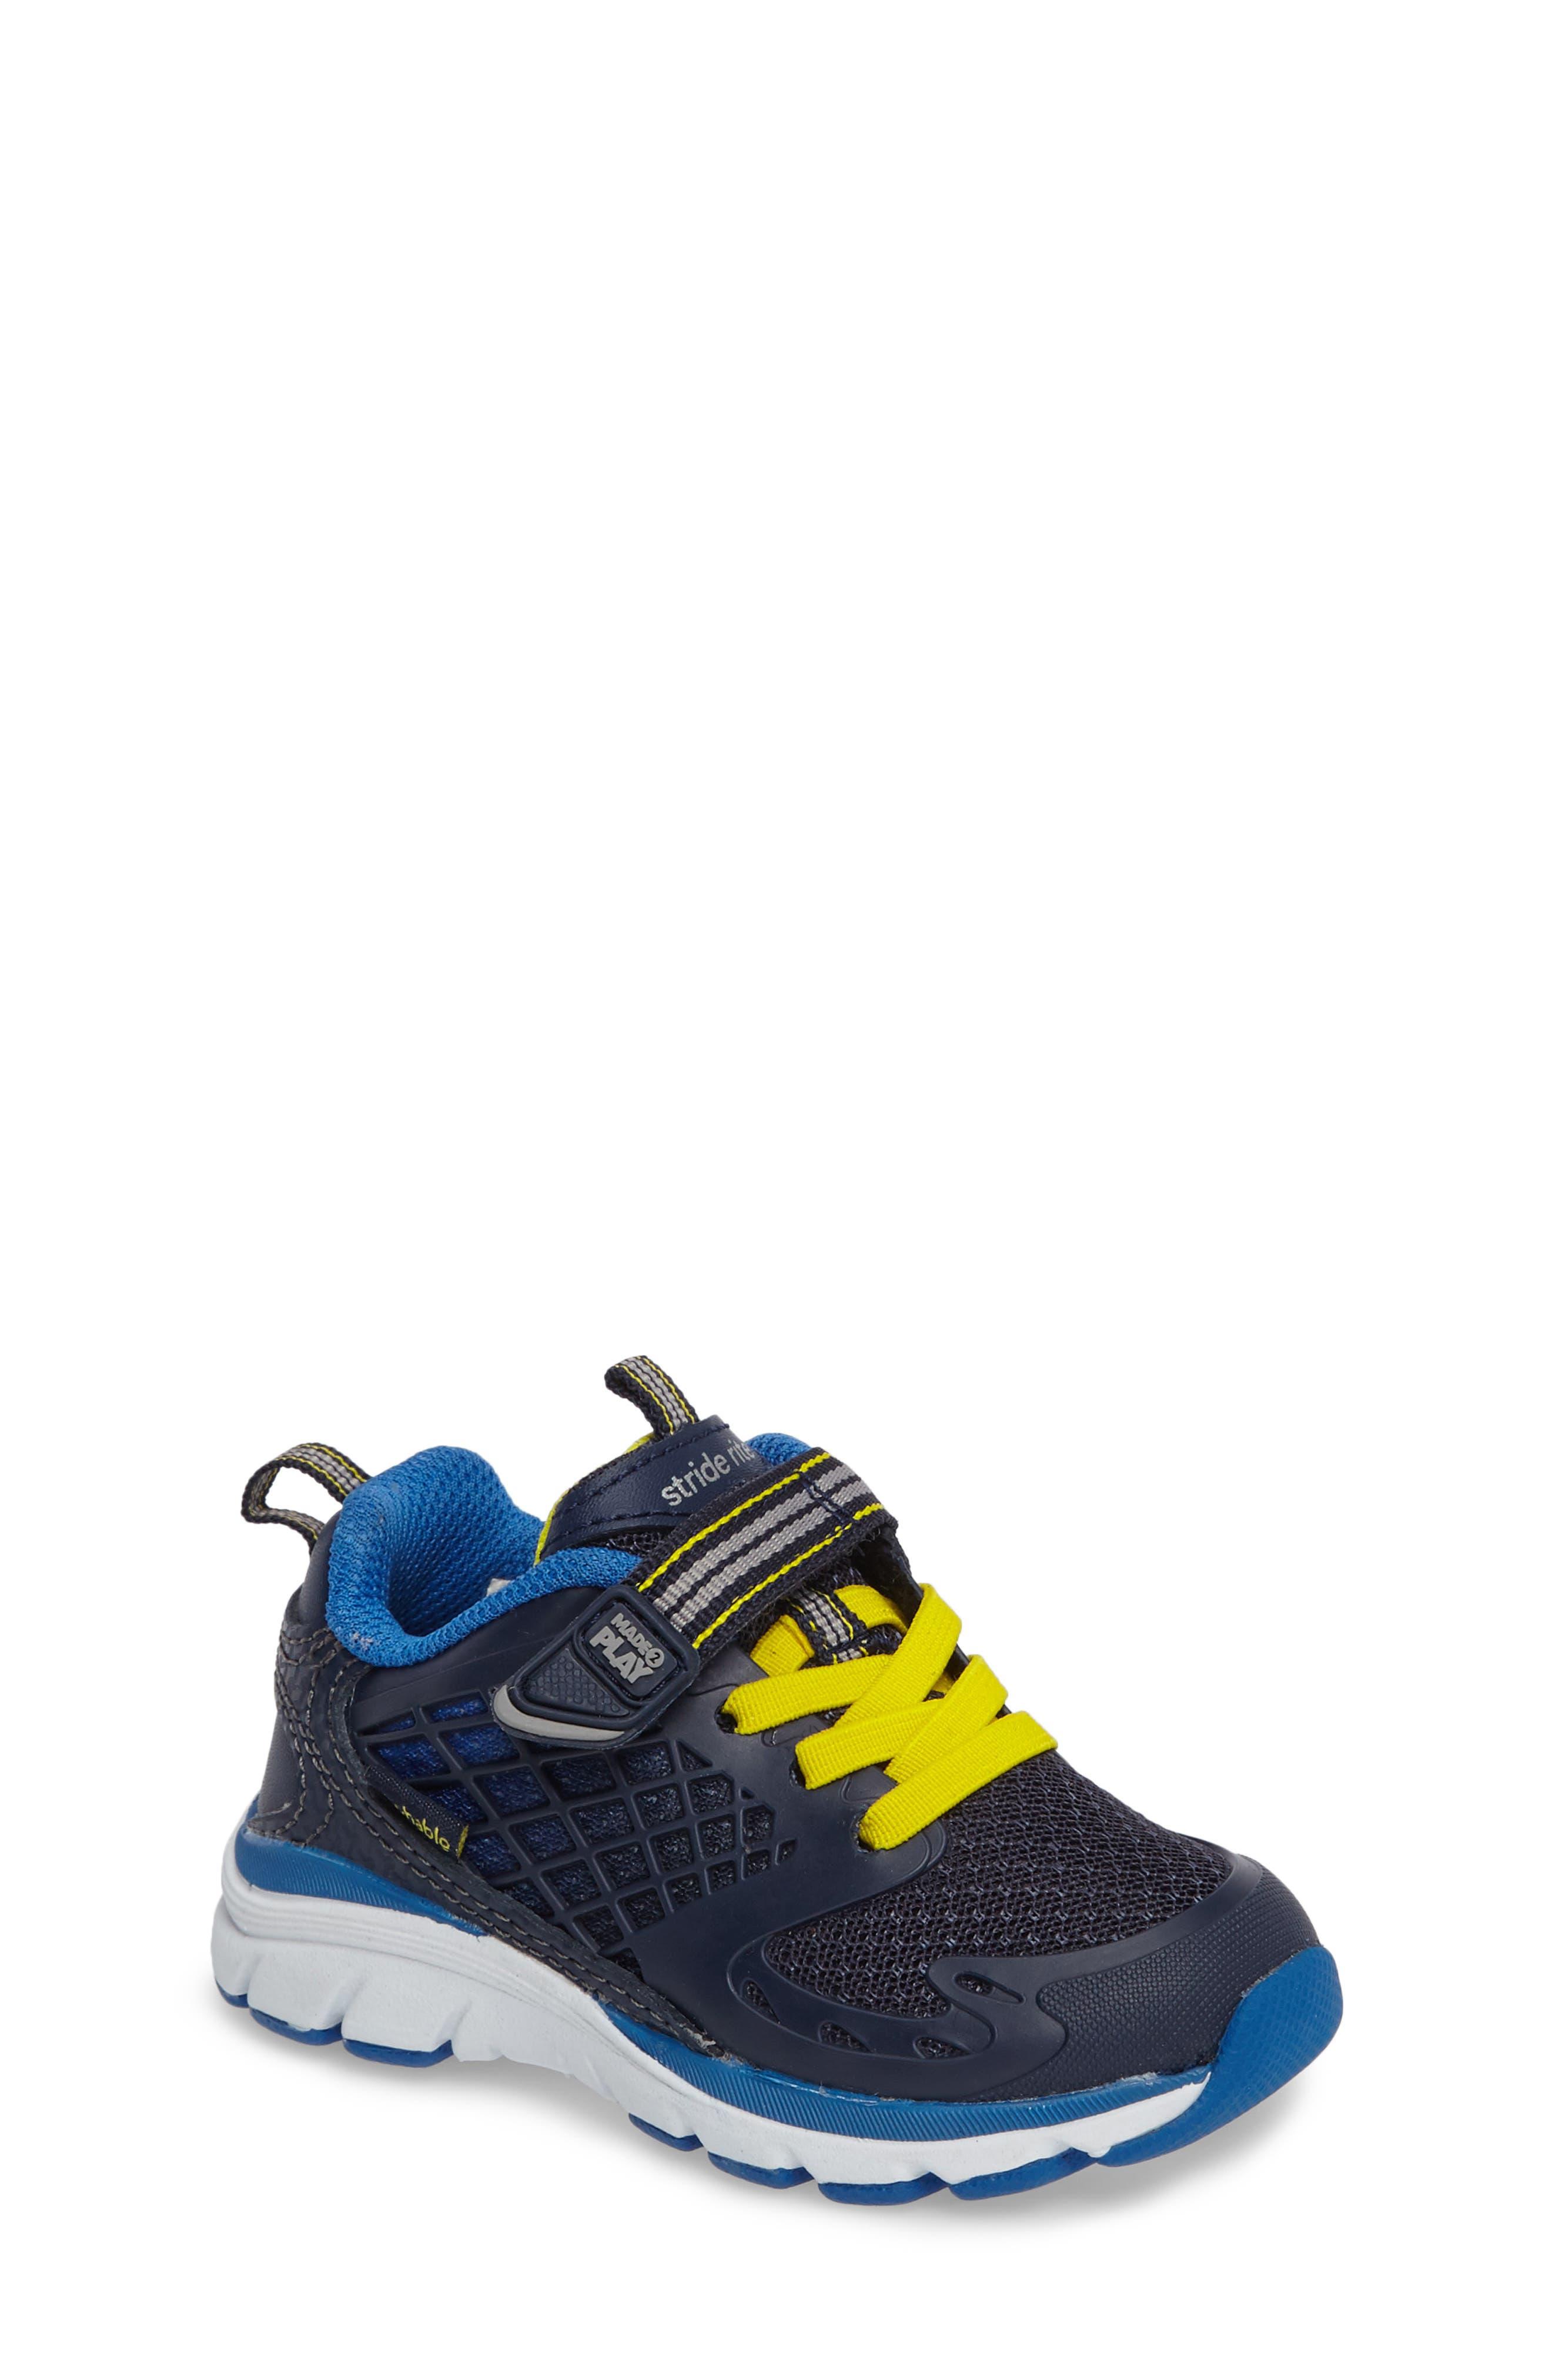 Made 2 Play Breccen Sneaker,                             Main thumbnail 1, color,                             Navy